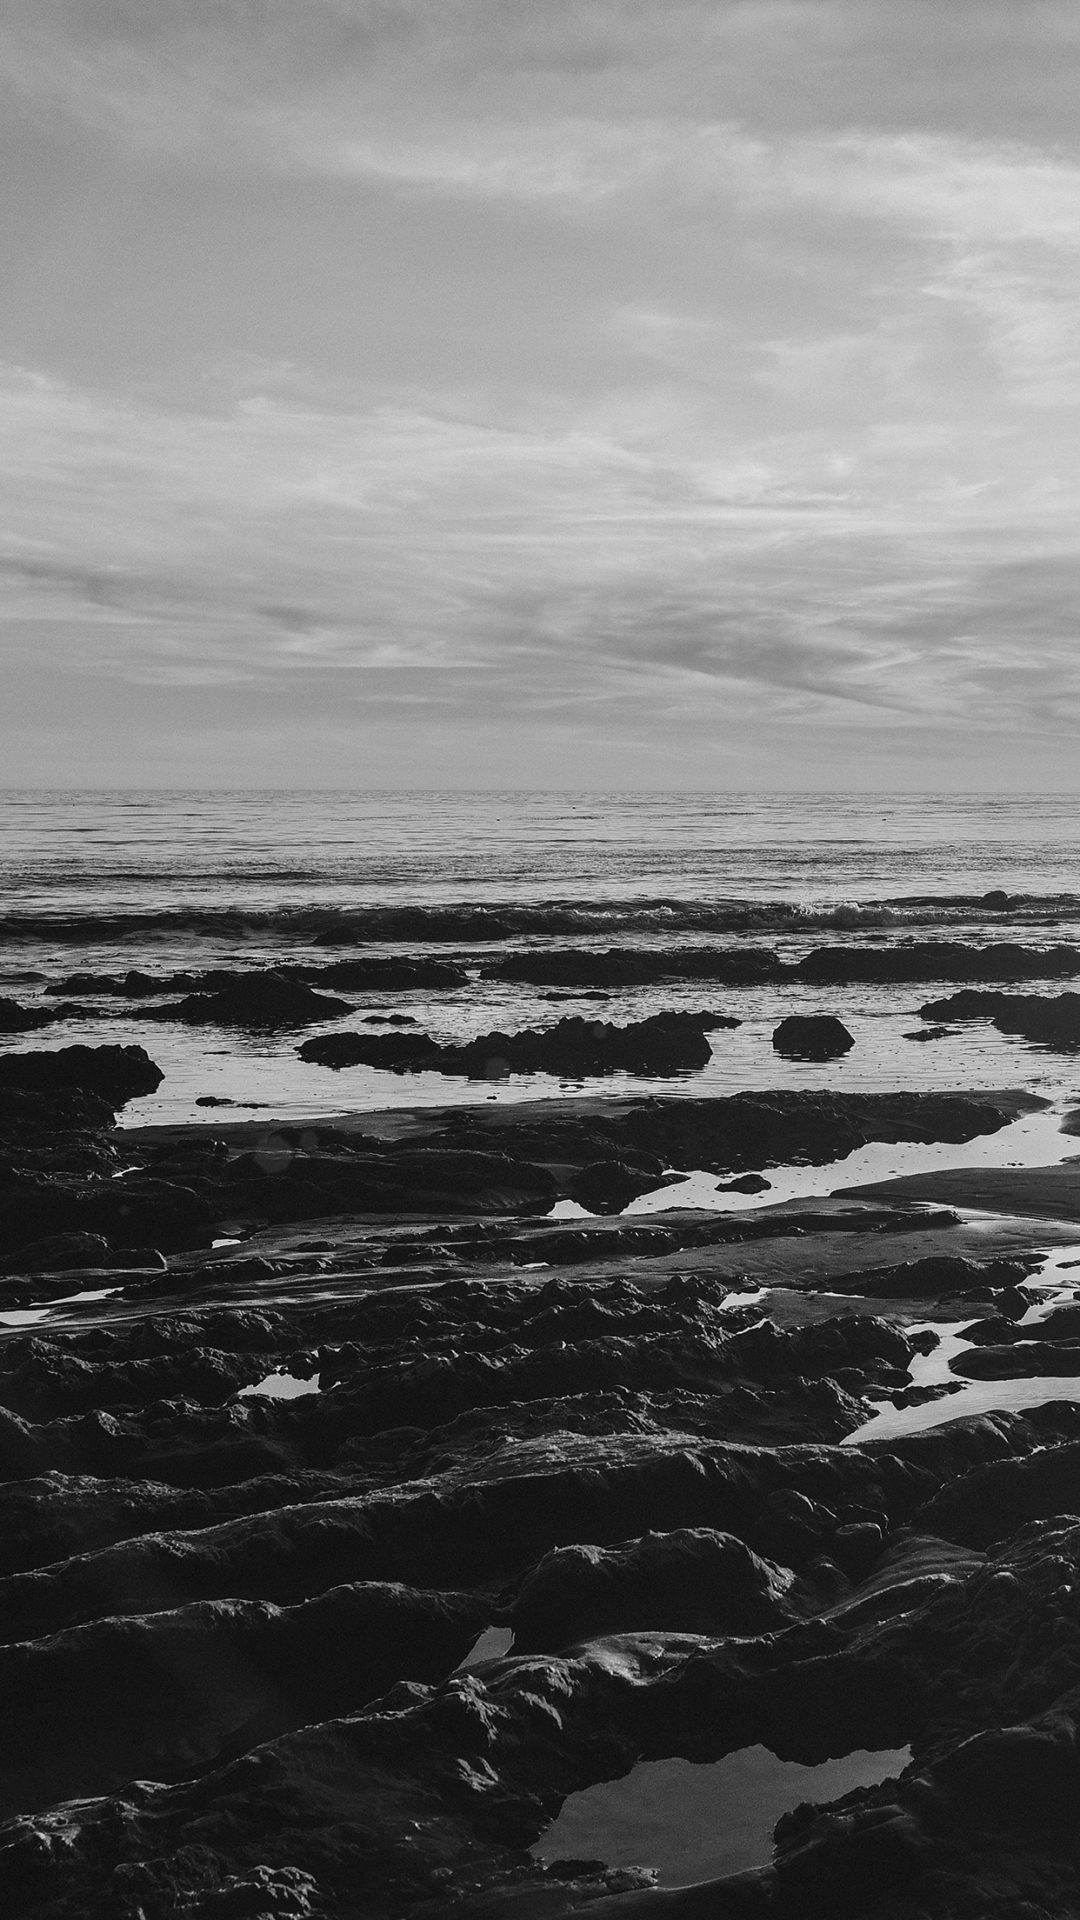 Ocean Sea Water Sky Sunset Afternoon Nature Dark Bw